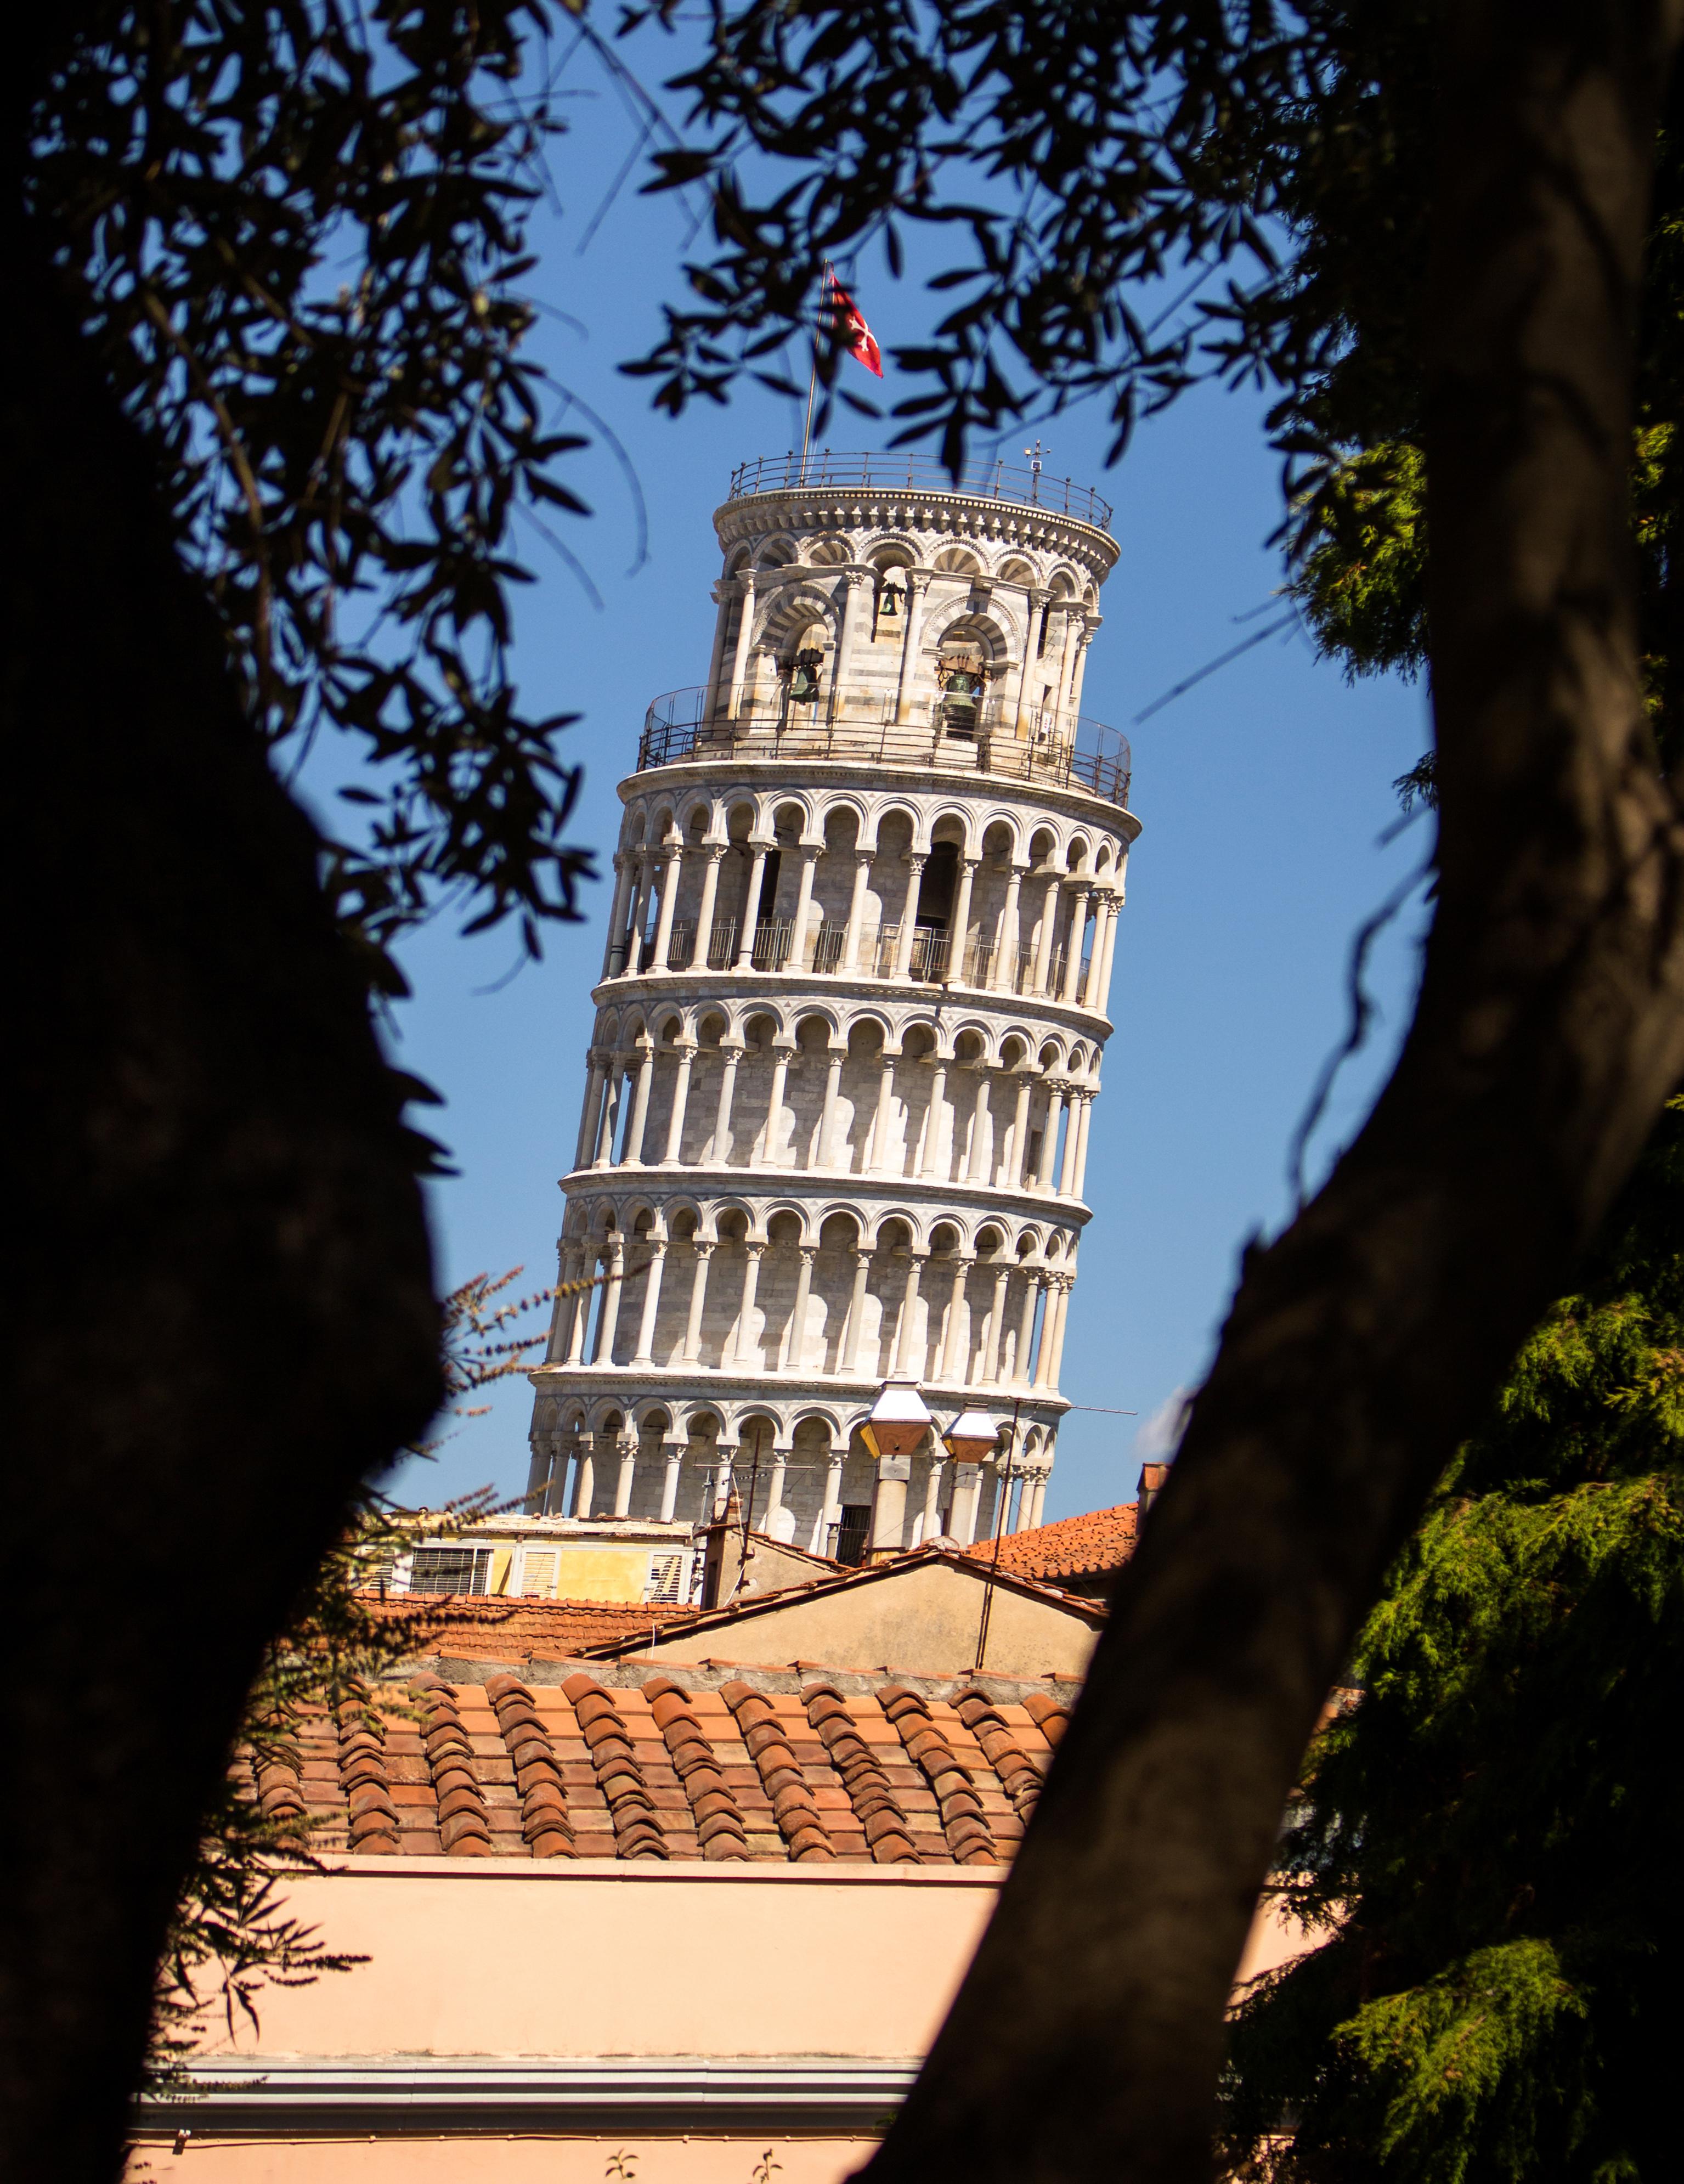 Un tesoro verde a un tiro de piedra de la Torre Inclinada - Italia Circuito Italia Monumental: de Roma a Milán